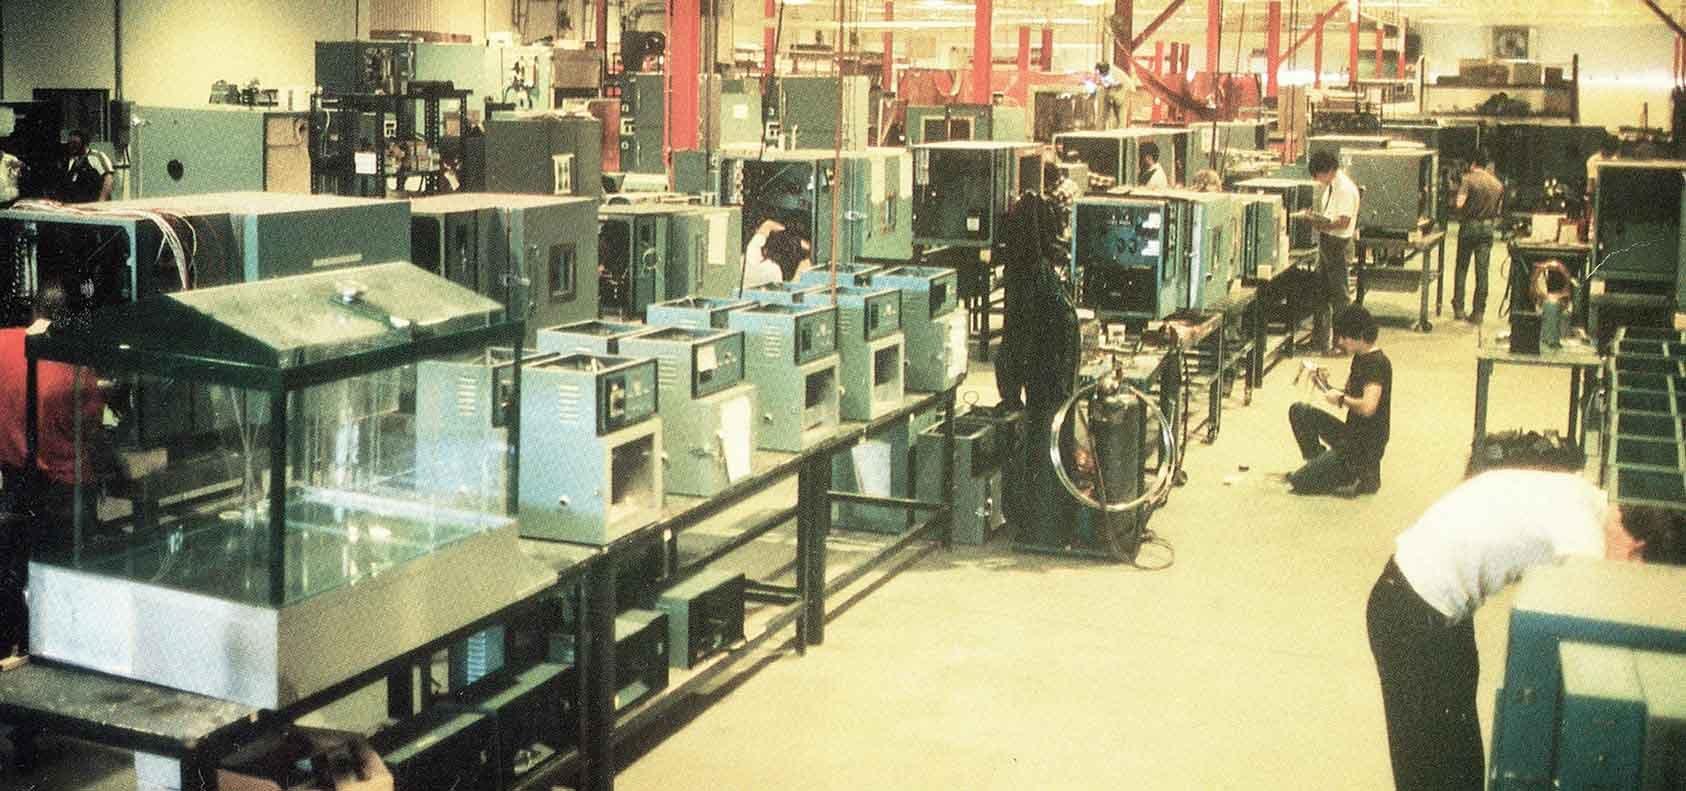 amesbury manufacturing facility associatedenvironmentalsystems